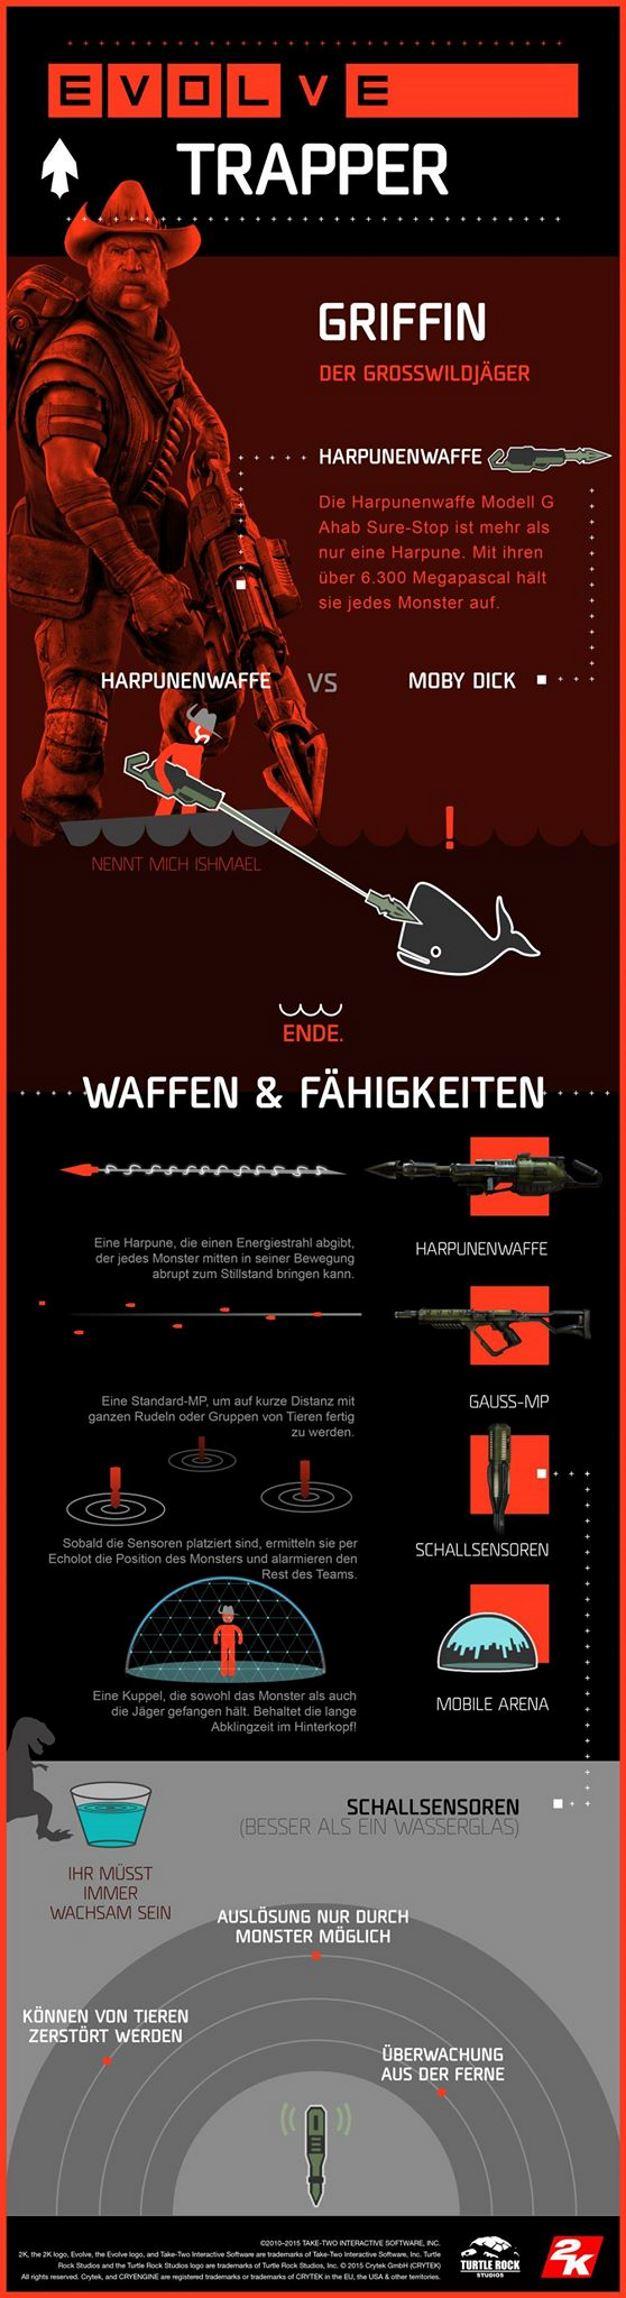 Evole Trapper Griffin Infografik